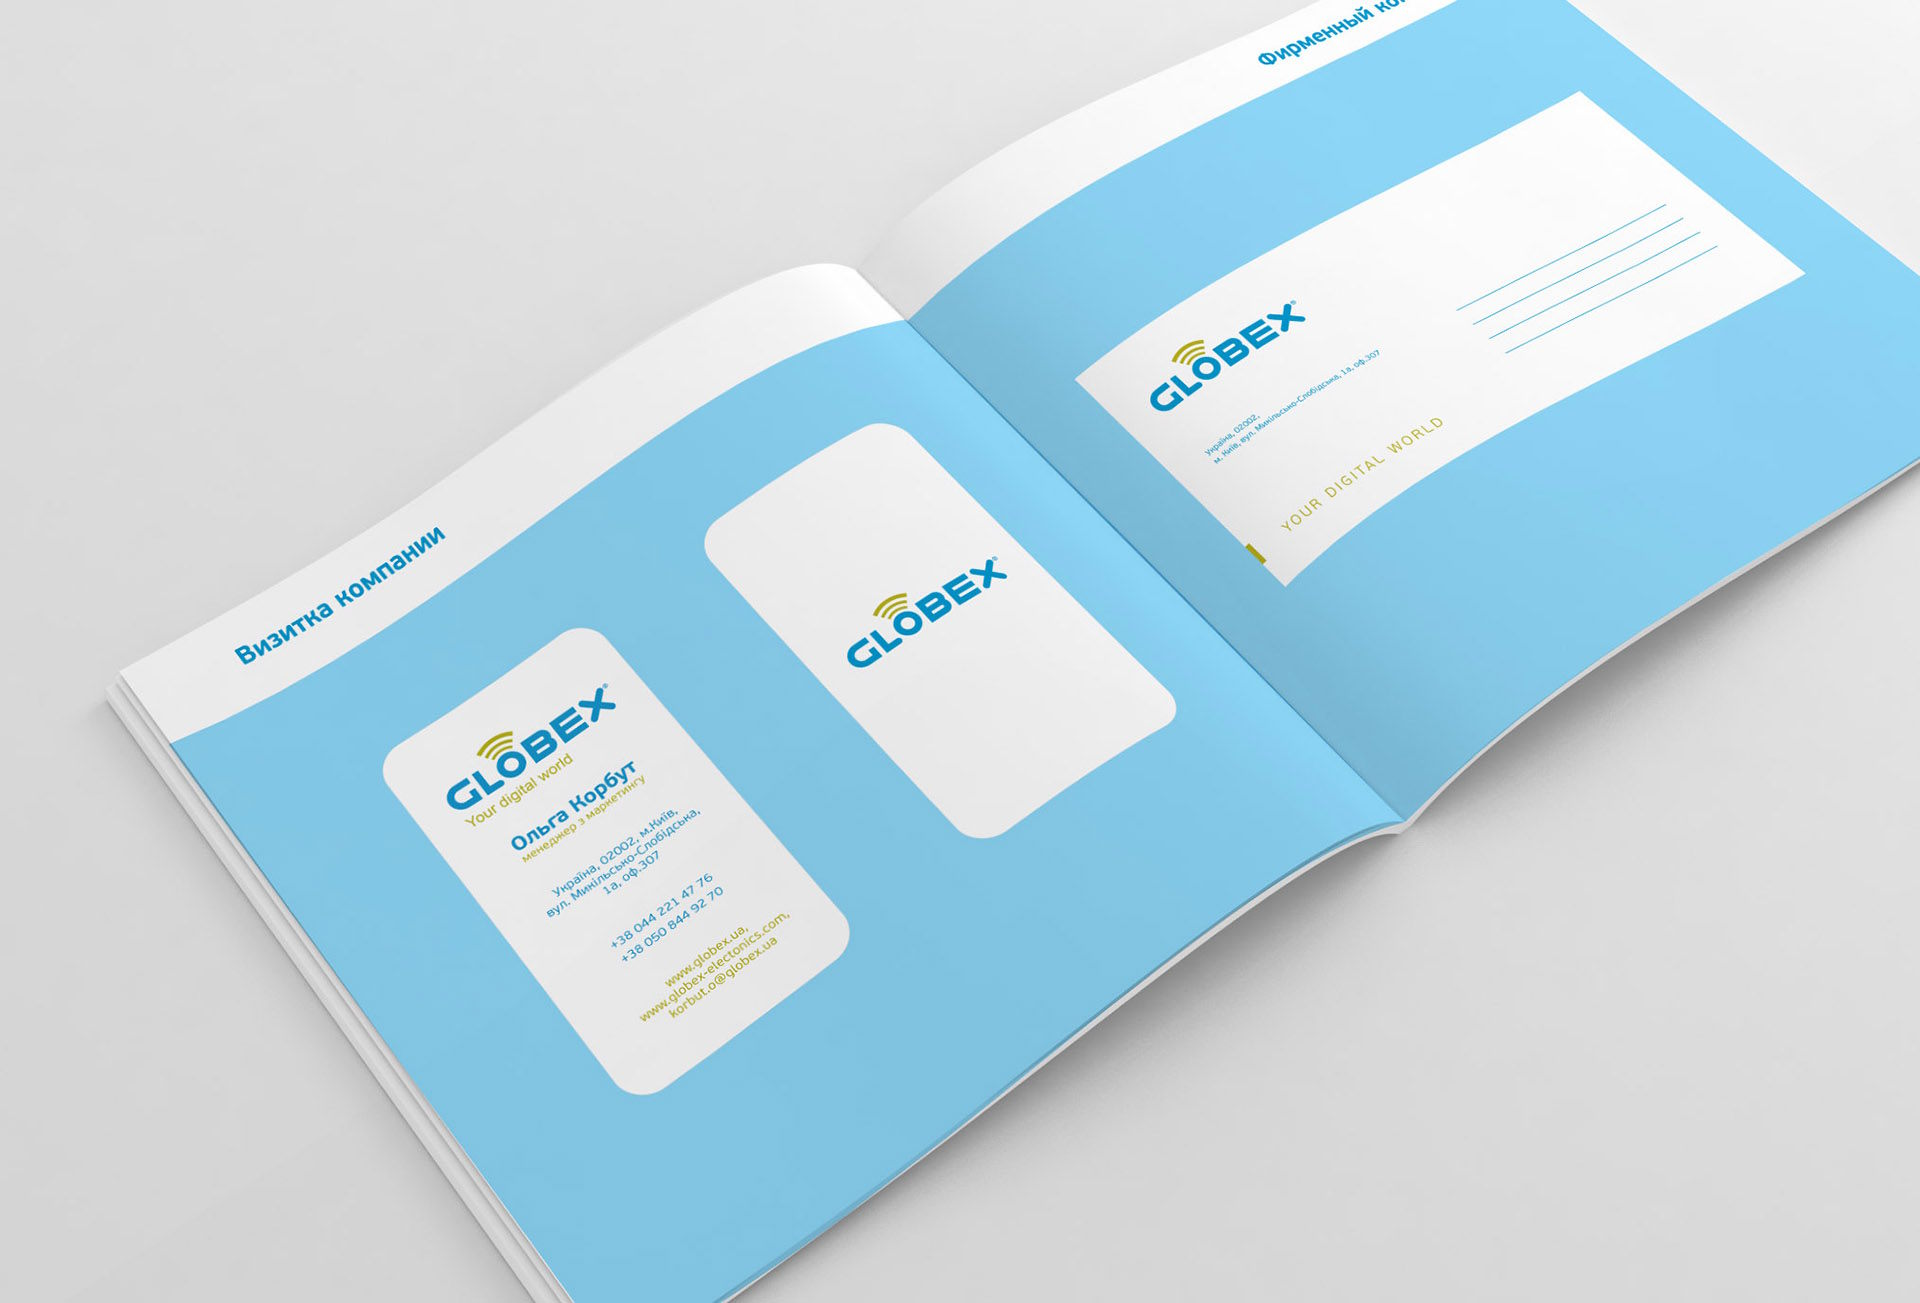 Создание of the brand book IT компании, IT company brandbook development